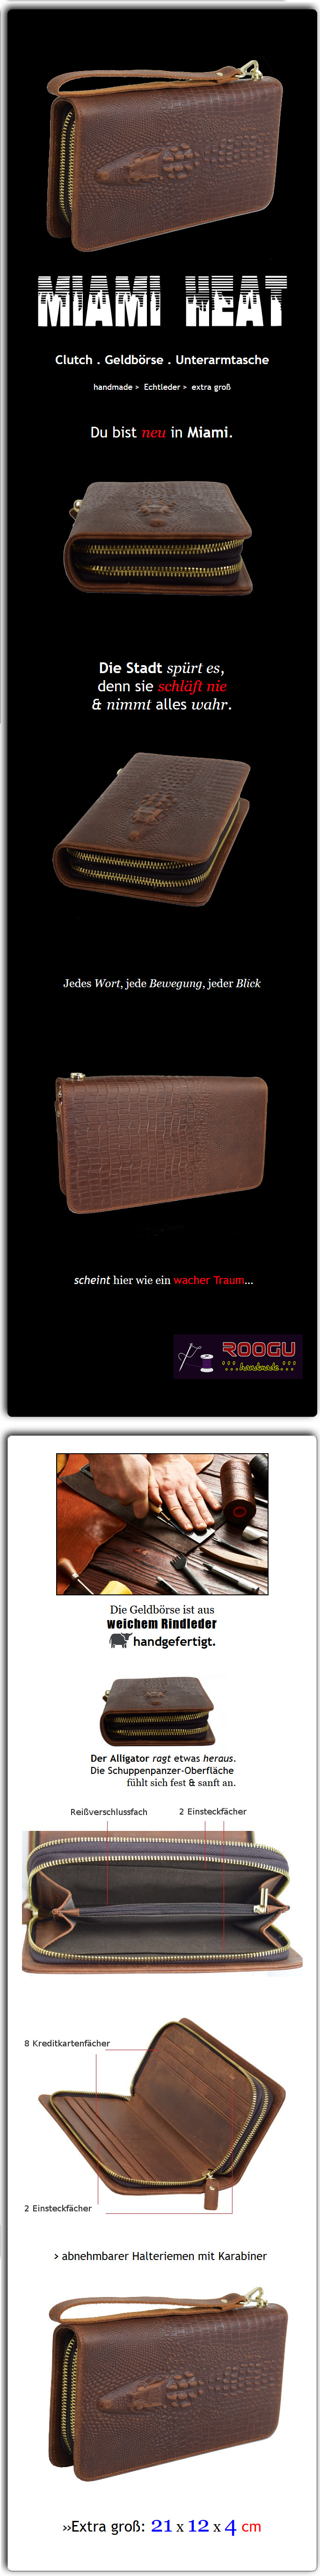 http://roogu.com/auction/W09.jpg